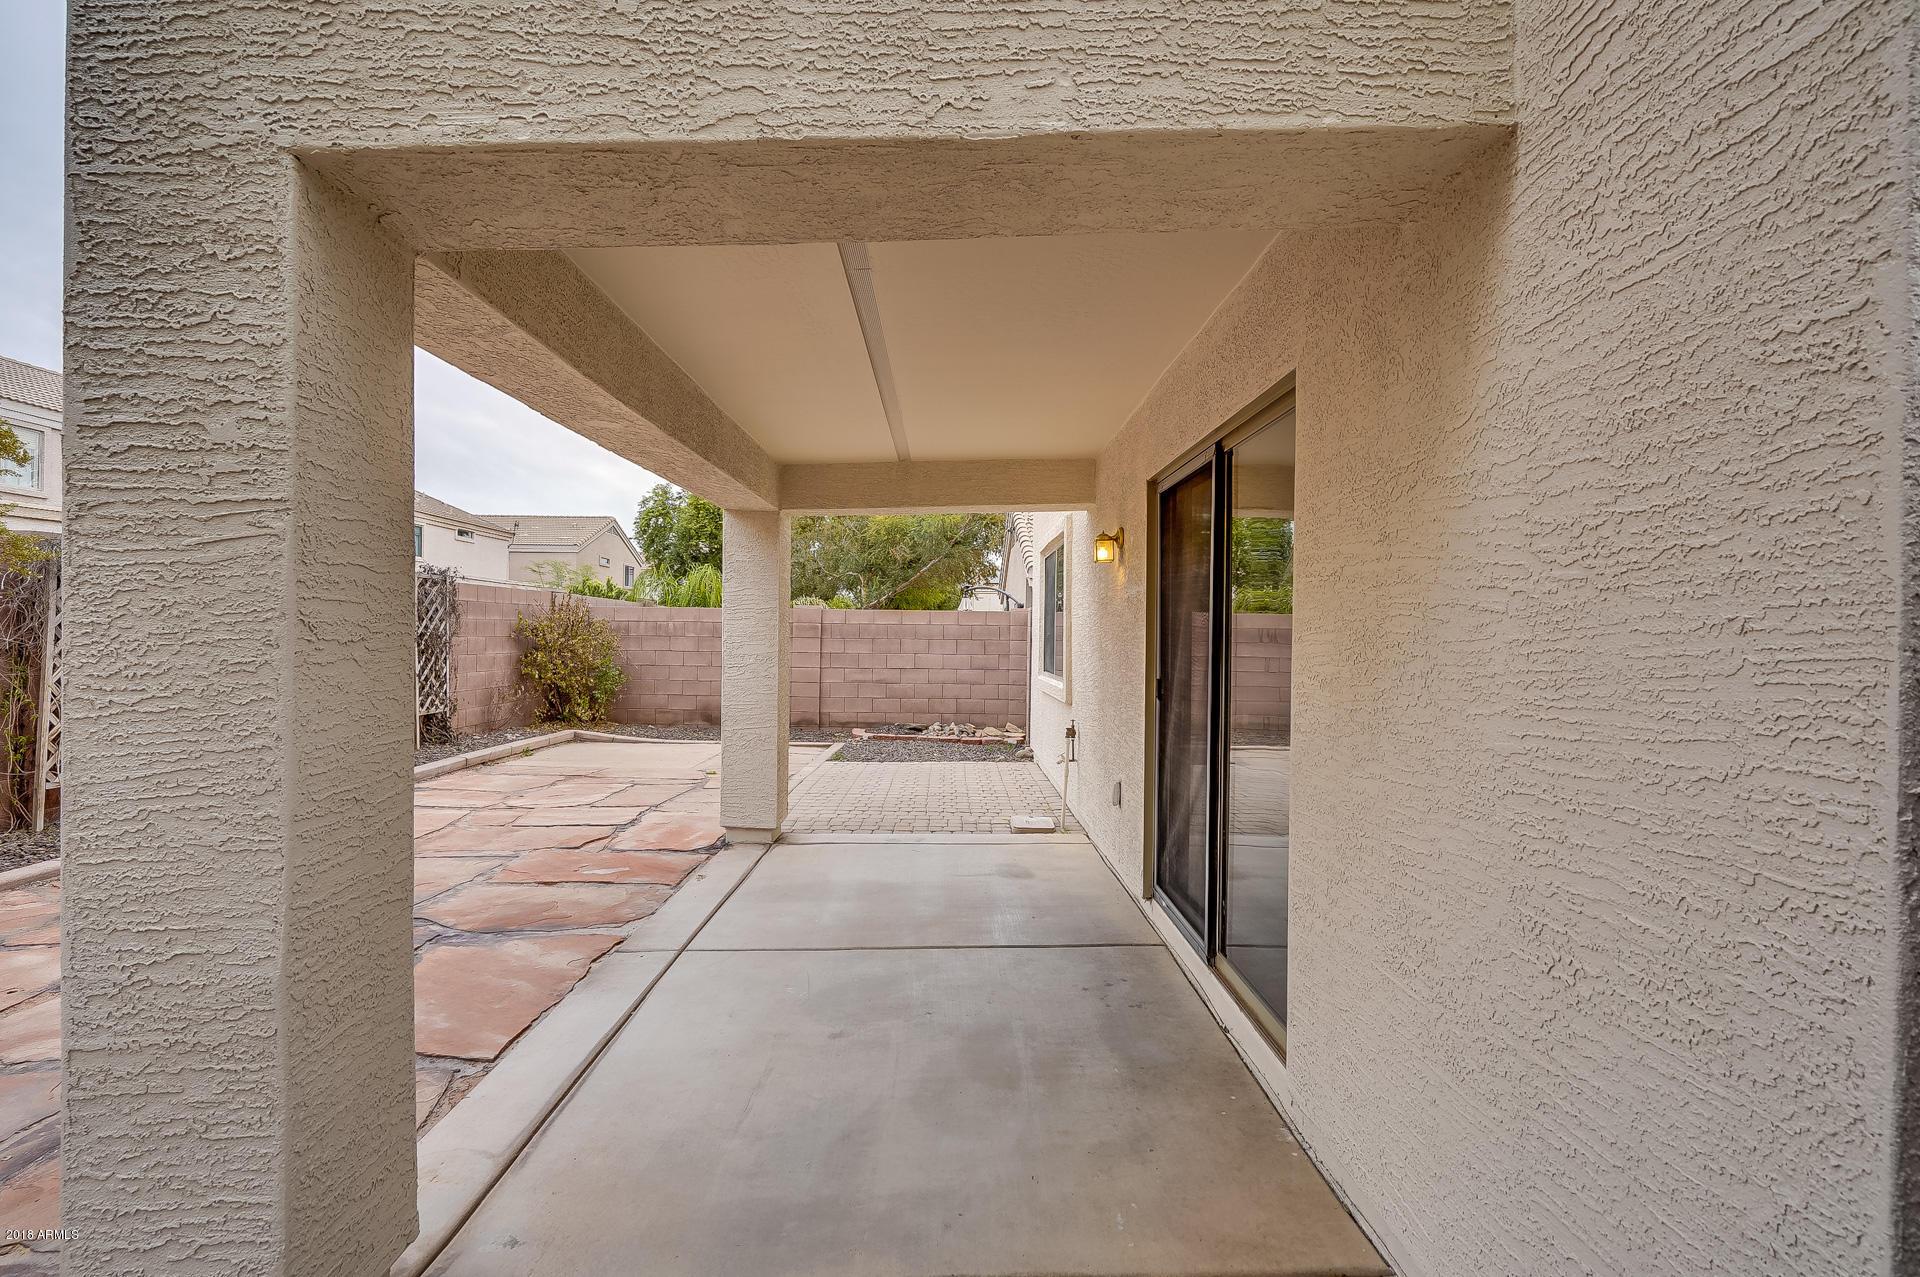 MLS 5852246 11482 W MADISEN ELLISE Drive, Surprise, AZ 85378 Surprise AZ Canyon Ridge West